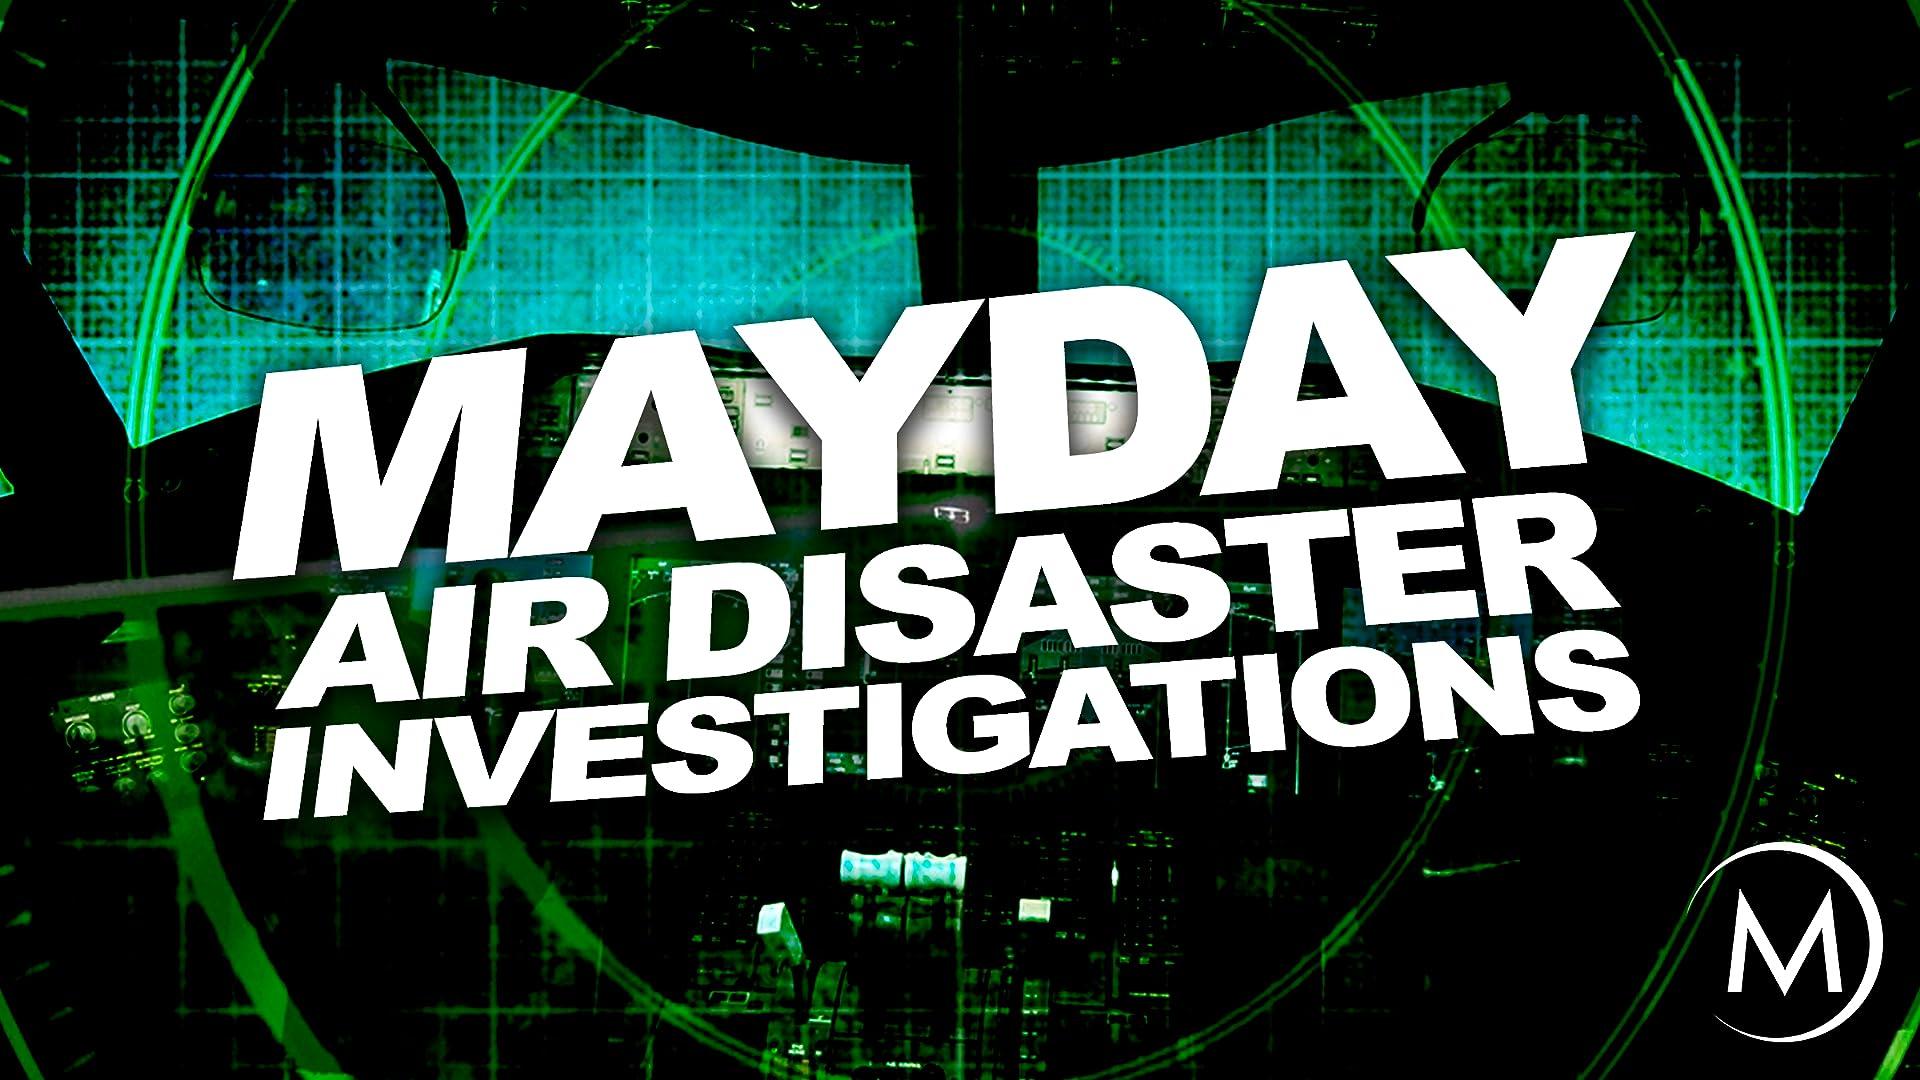 MayDay: Air Disaster Investigations